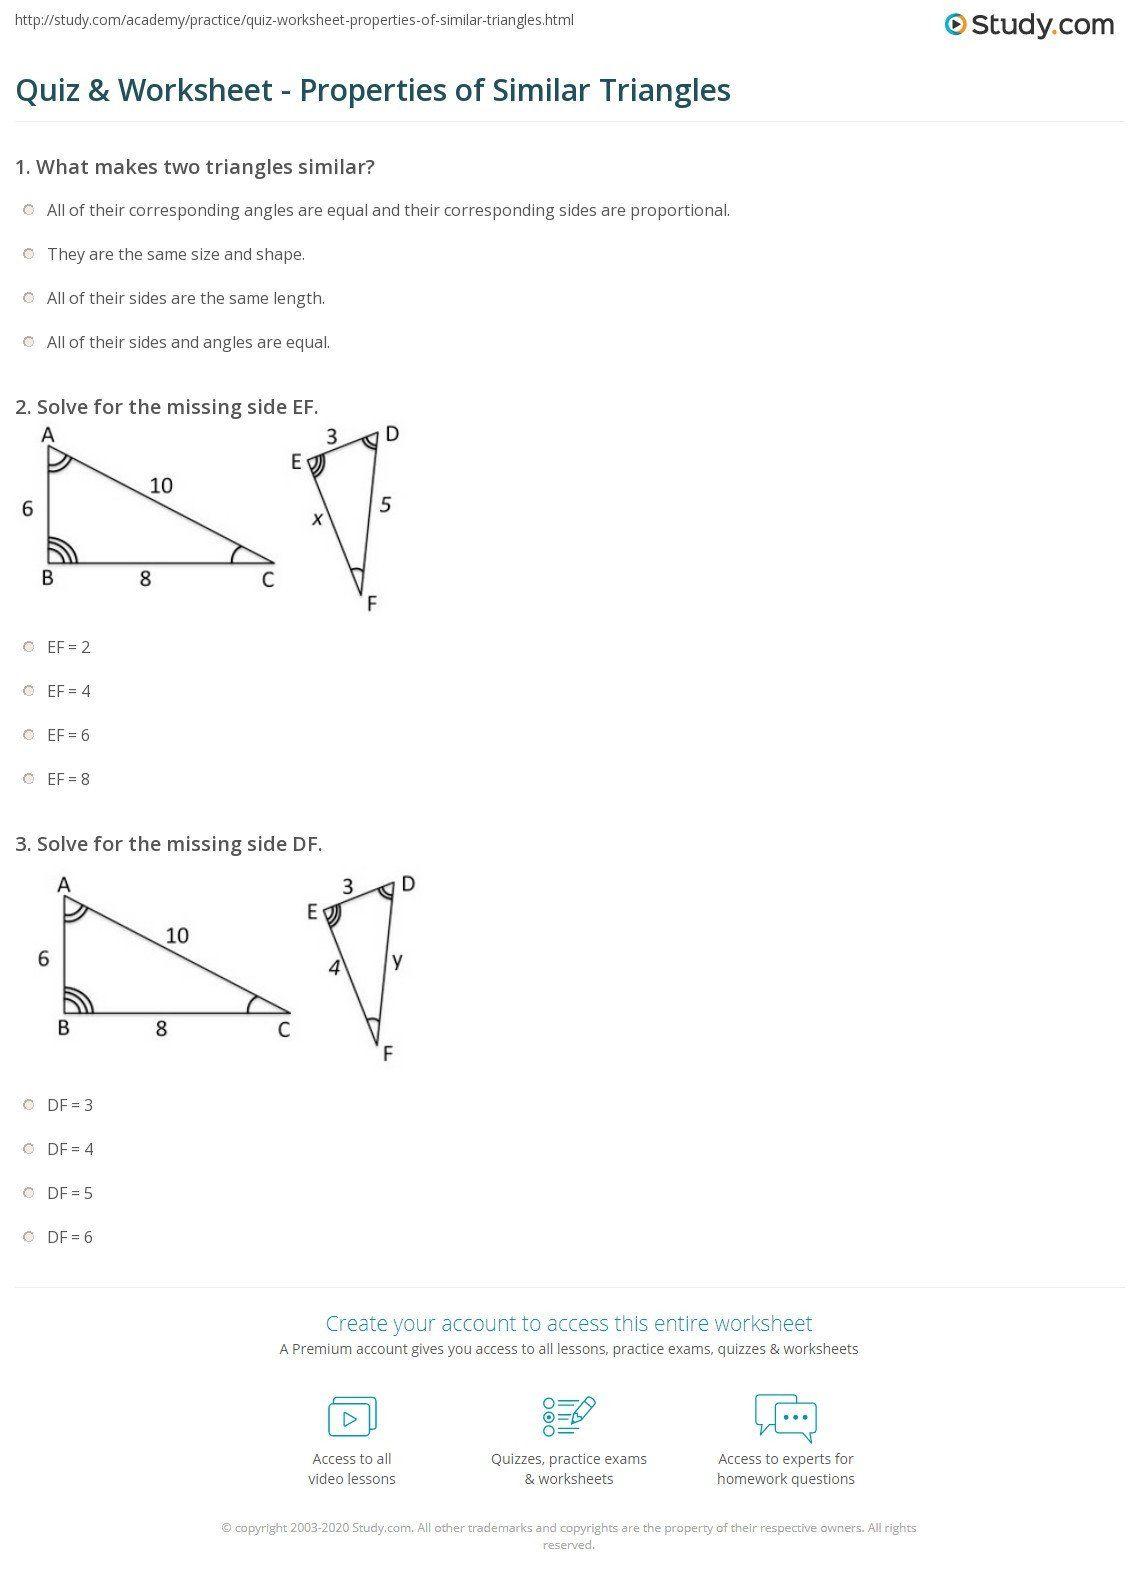 Similar Figures Worksheet Answer Key Quiz Worksheet Properties Of Similar Triangles In 2020 Triangle Worksheet Word Problem Worksheets Sight Word Worksheets